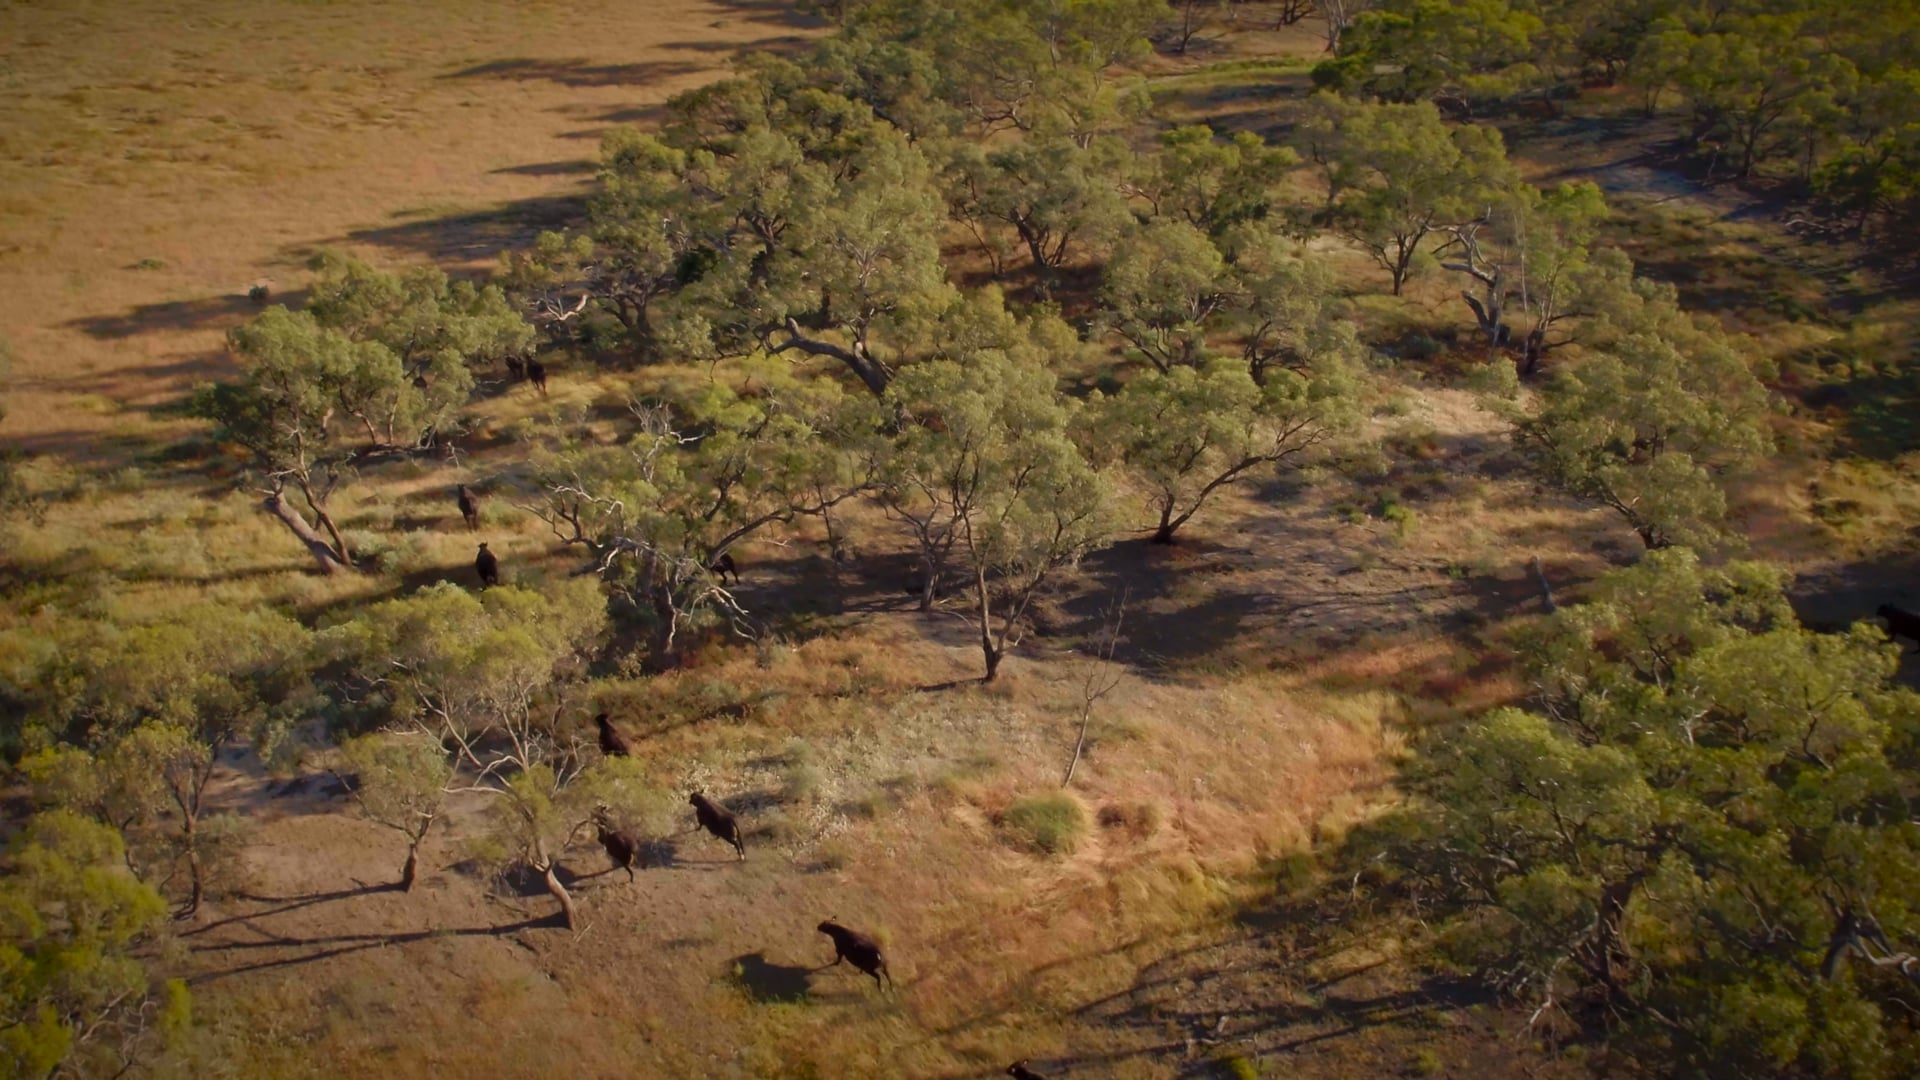 AMG - Australian Meat Group